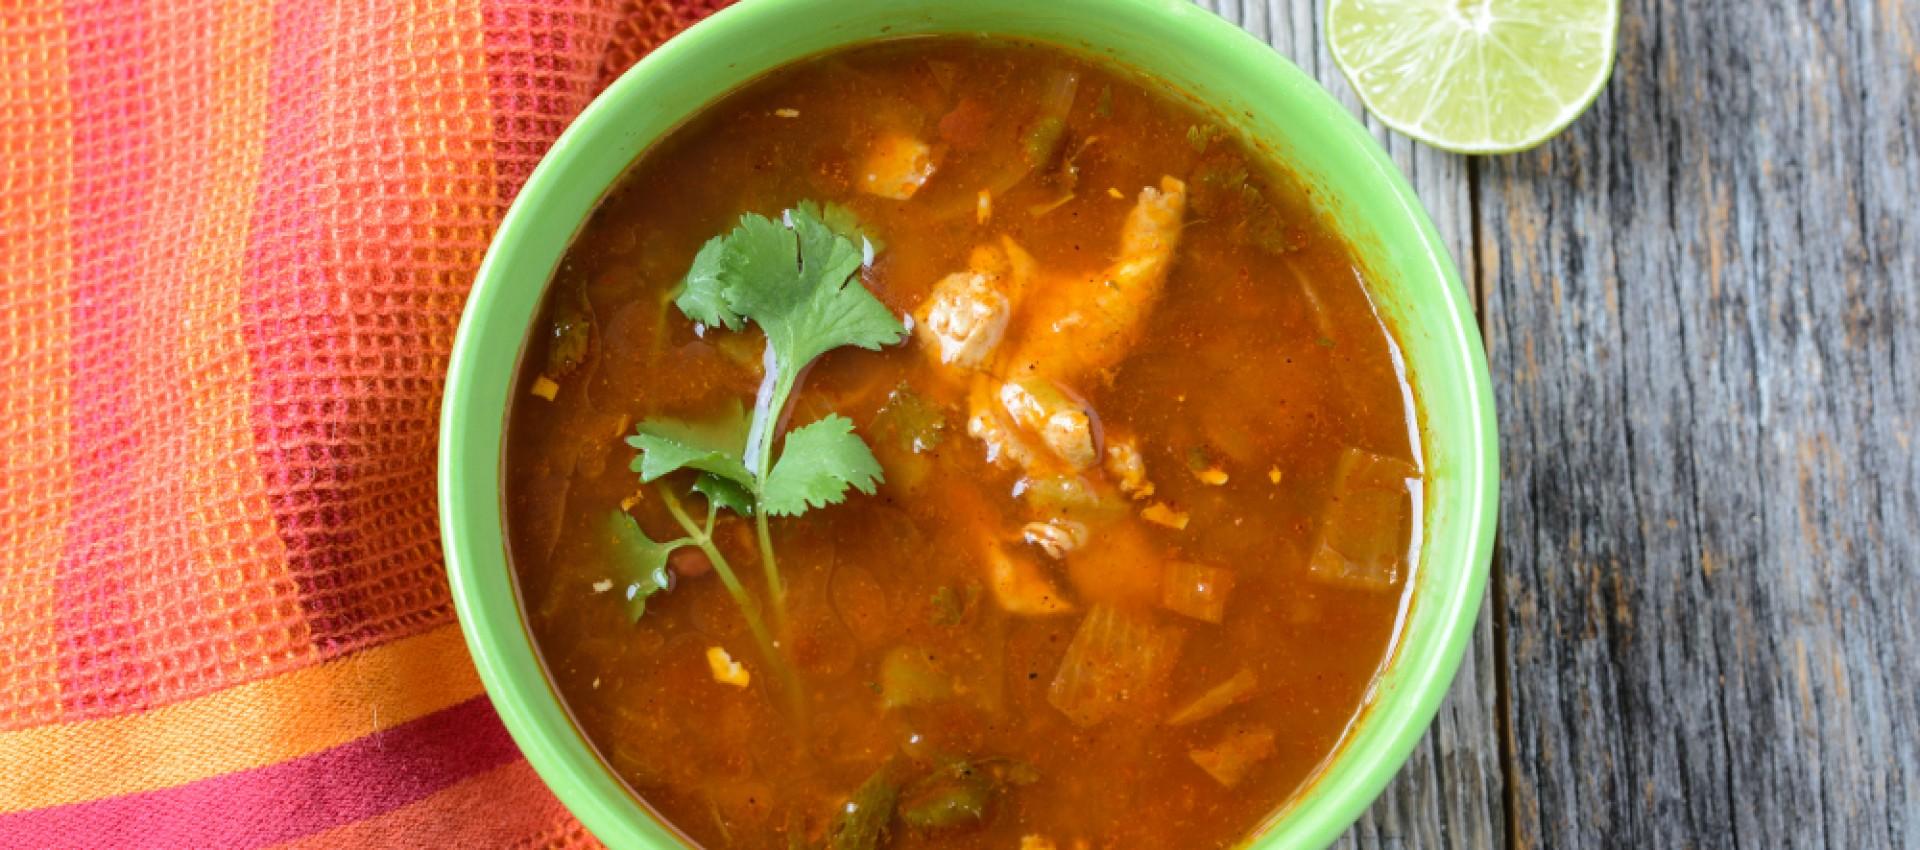 Authentic Tortilla Soup Recipe Image